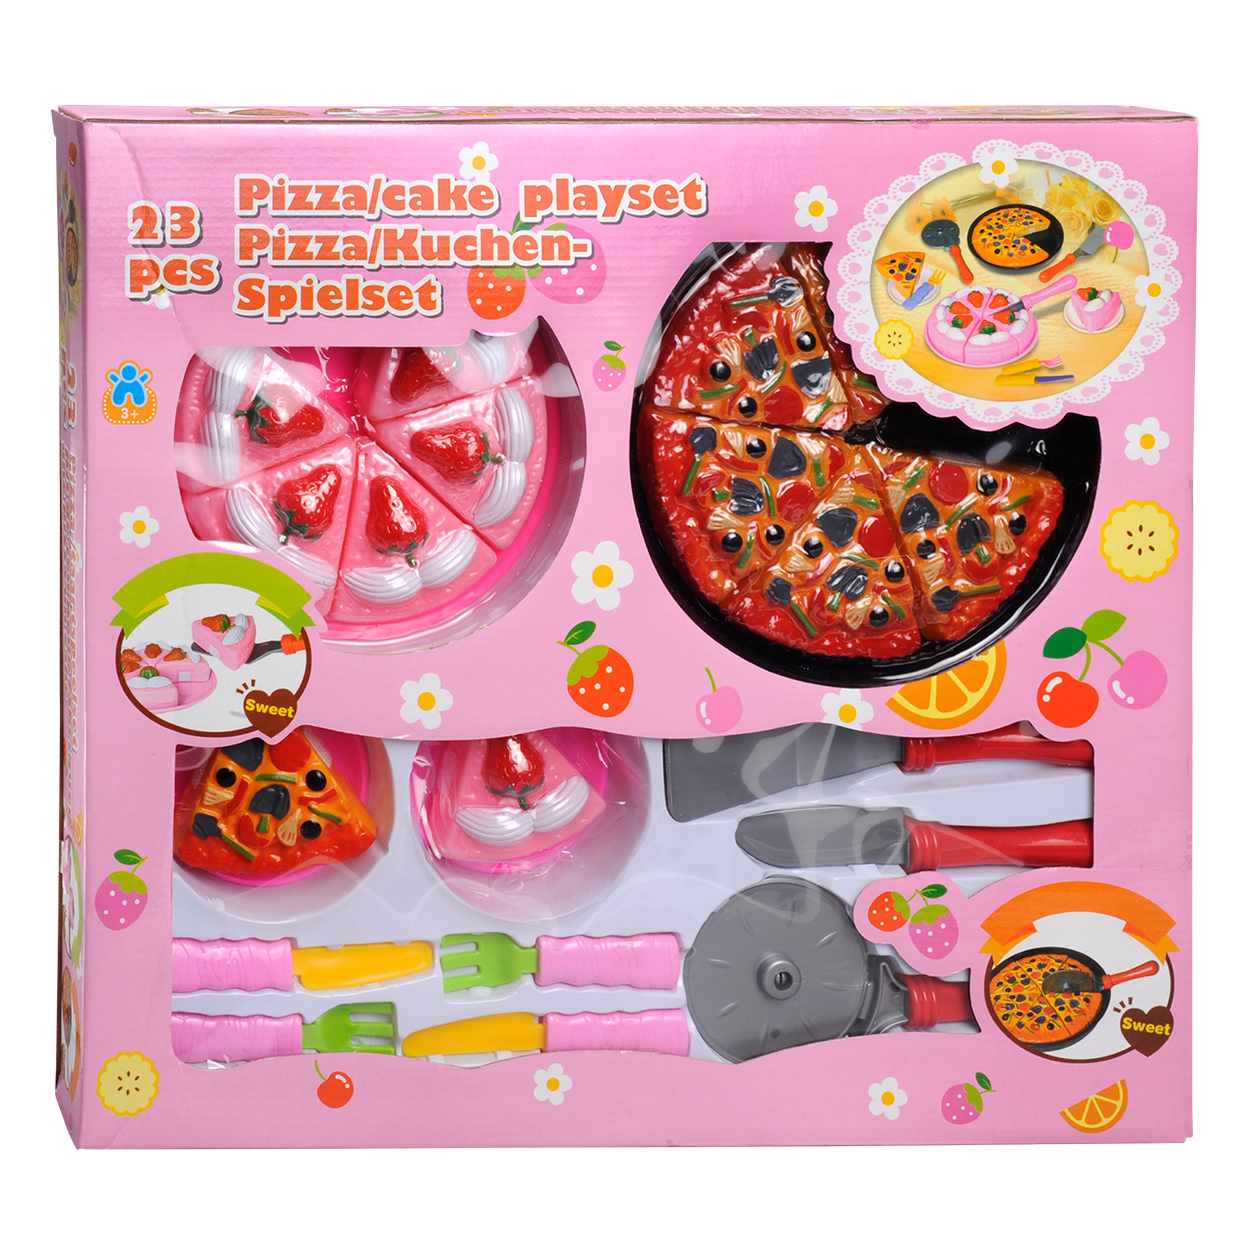 Disney Keukenaccessoires : Pizza en Taart Speelset, 23dlg online kopen Lobbes nl